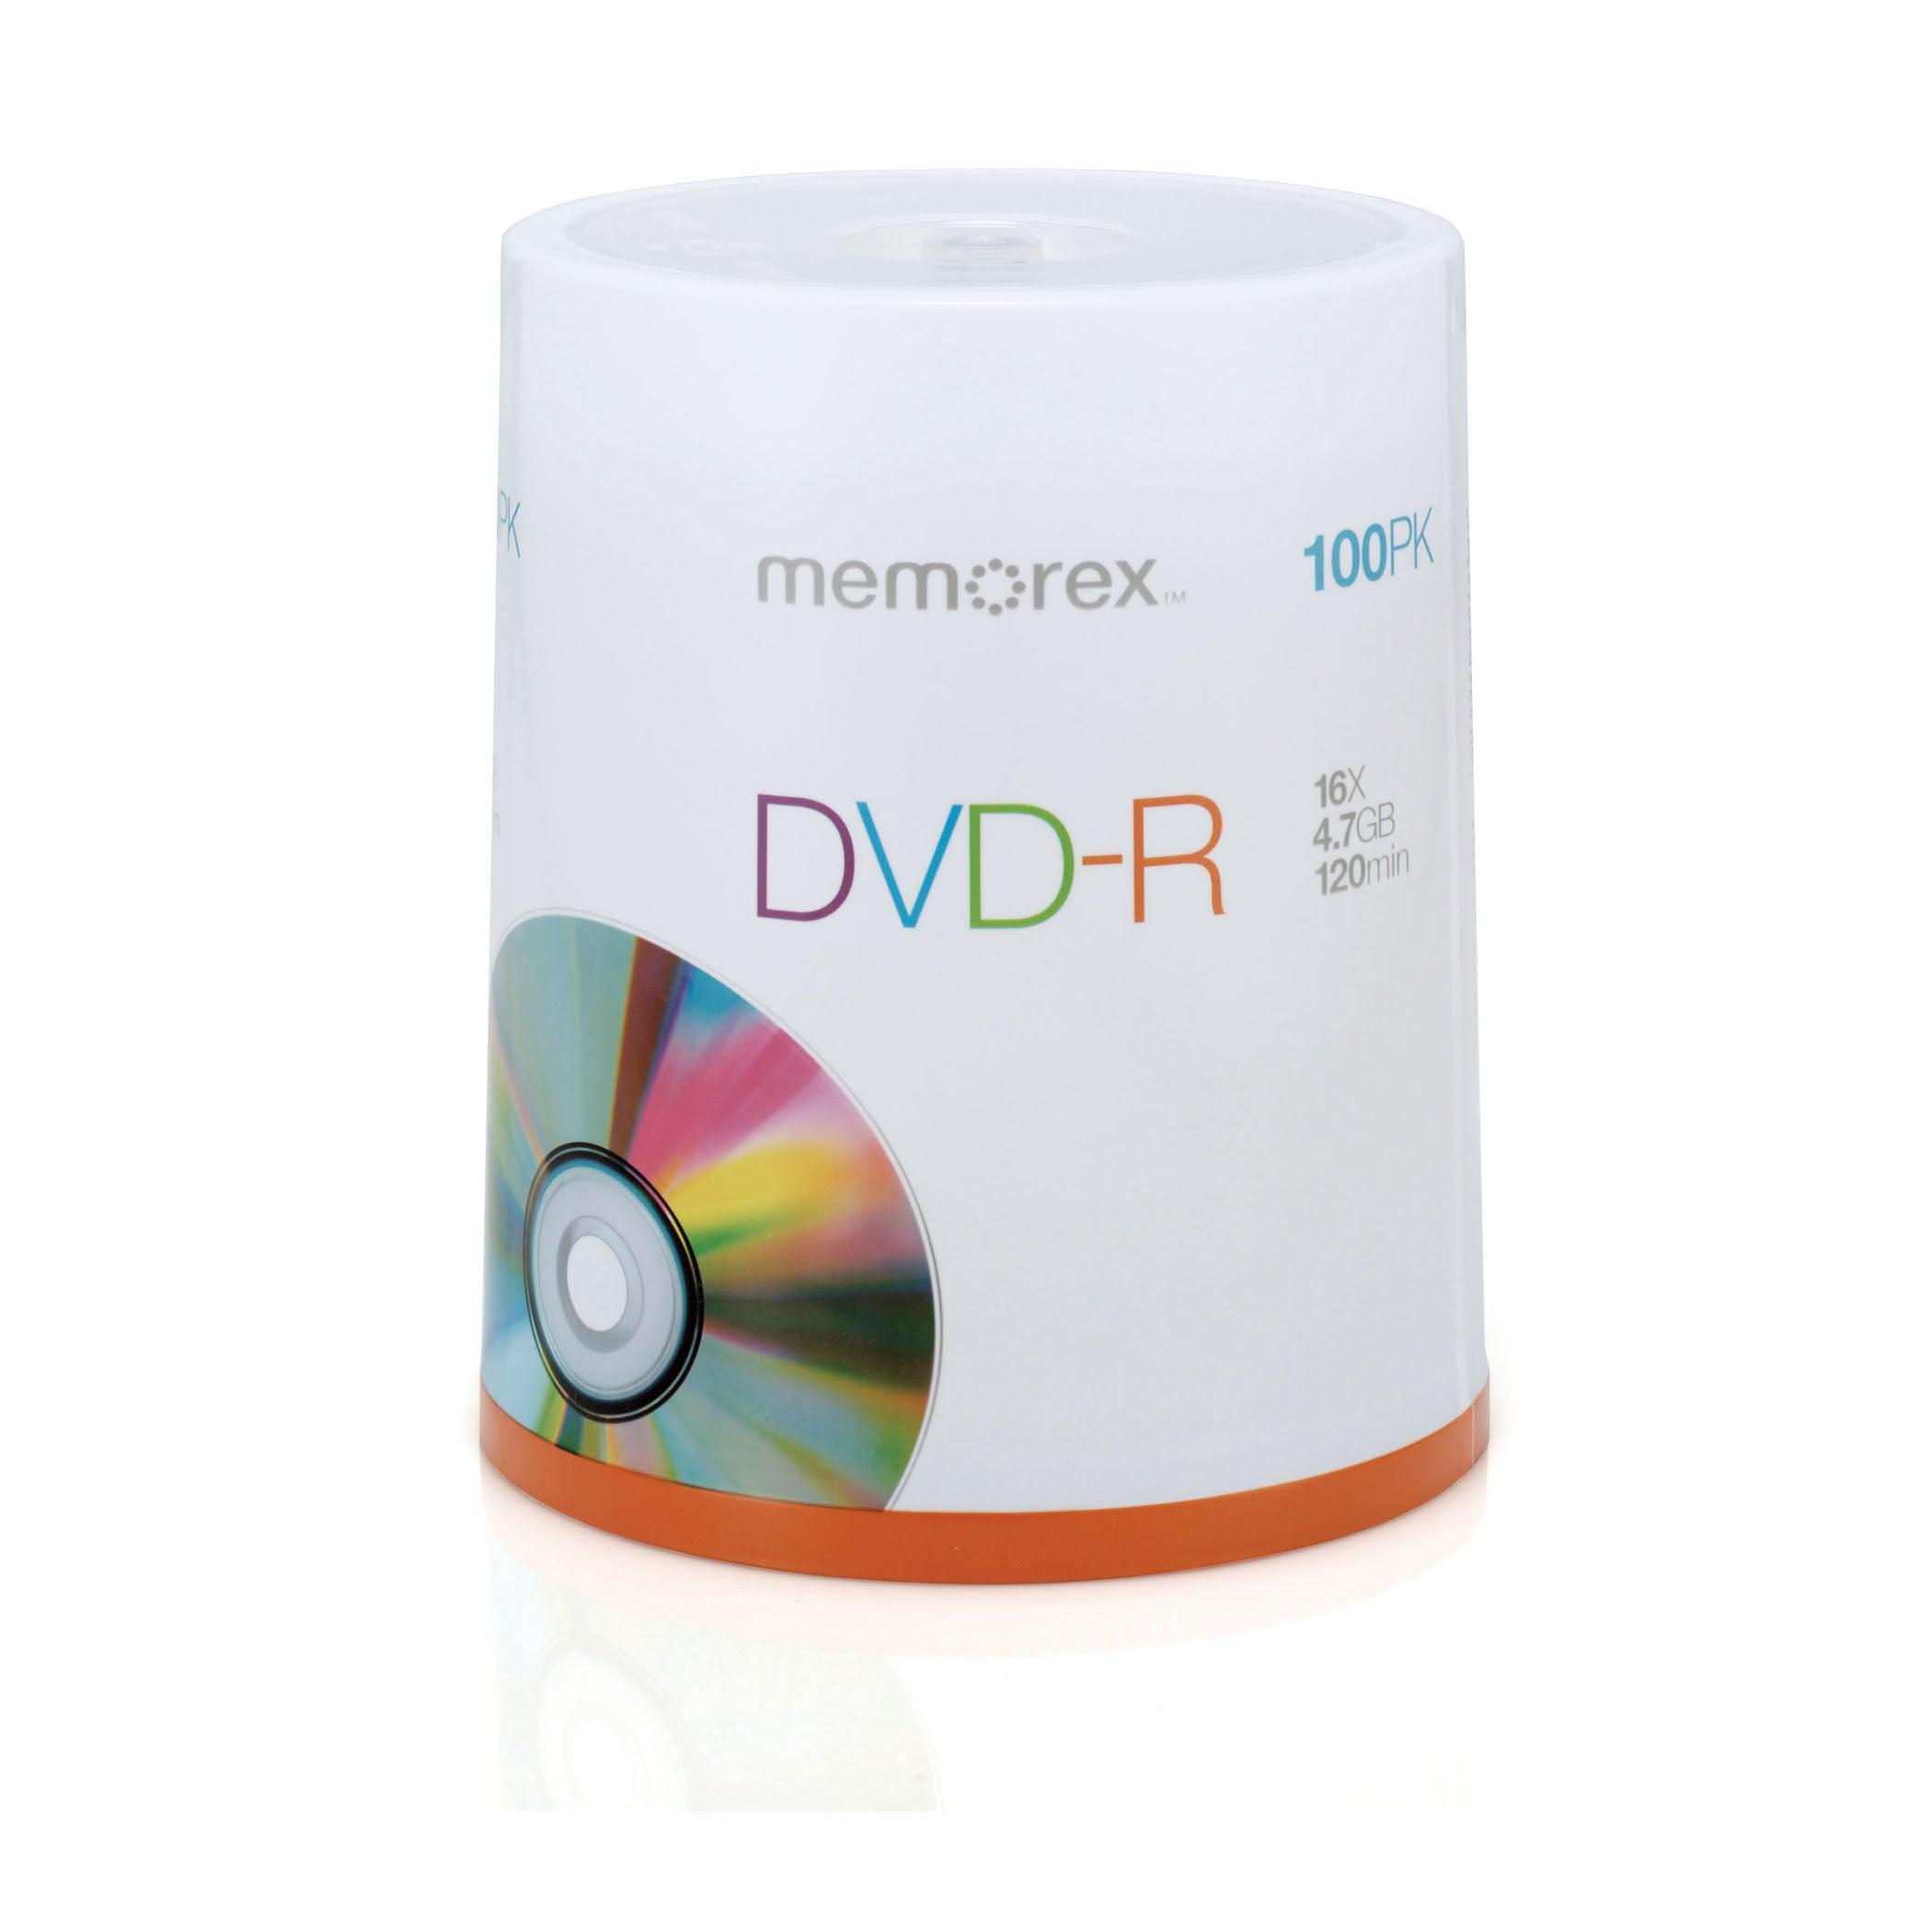 Memorex 16x DVD-R Media